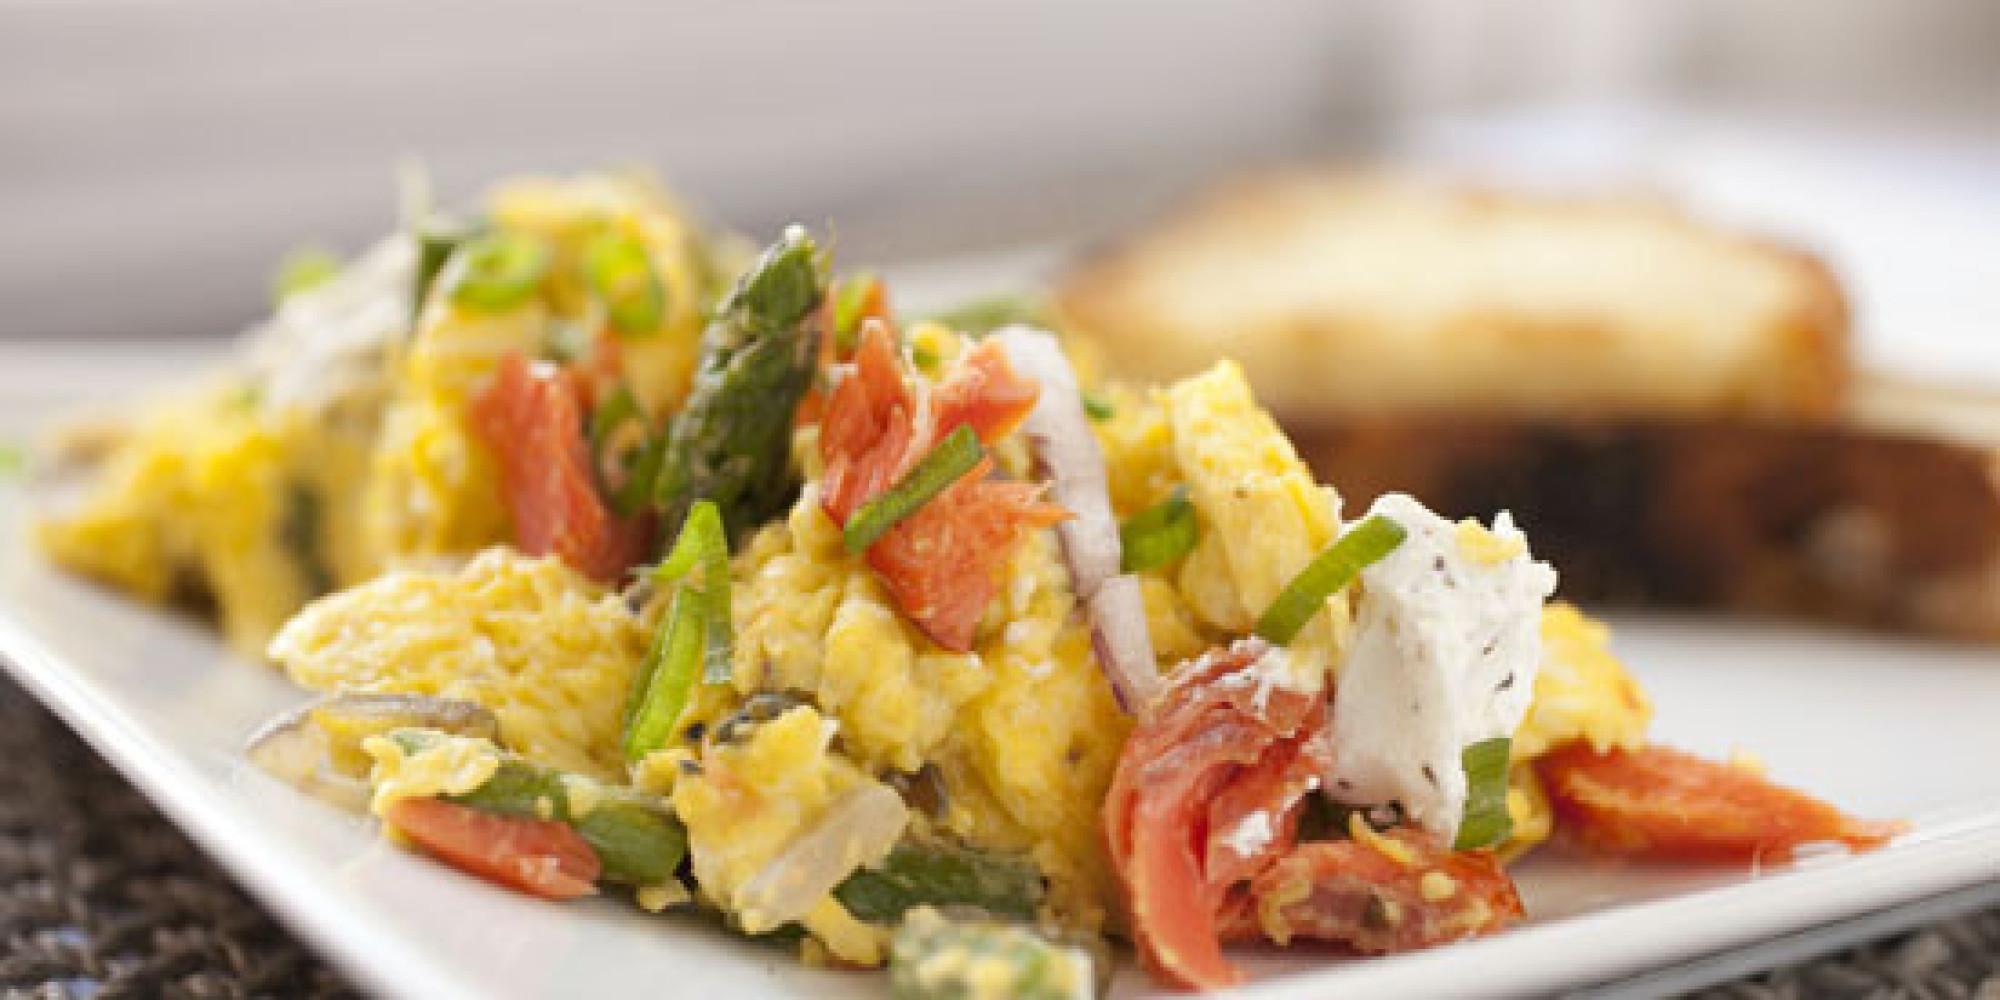 The Best Scrambled Egg Recipes You'll Ever Make (PHOTOS)